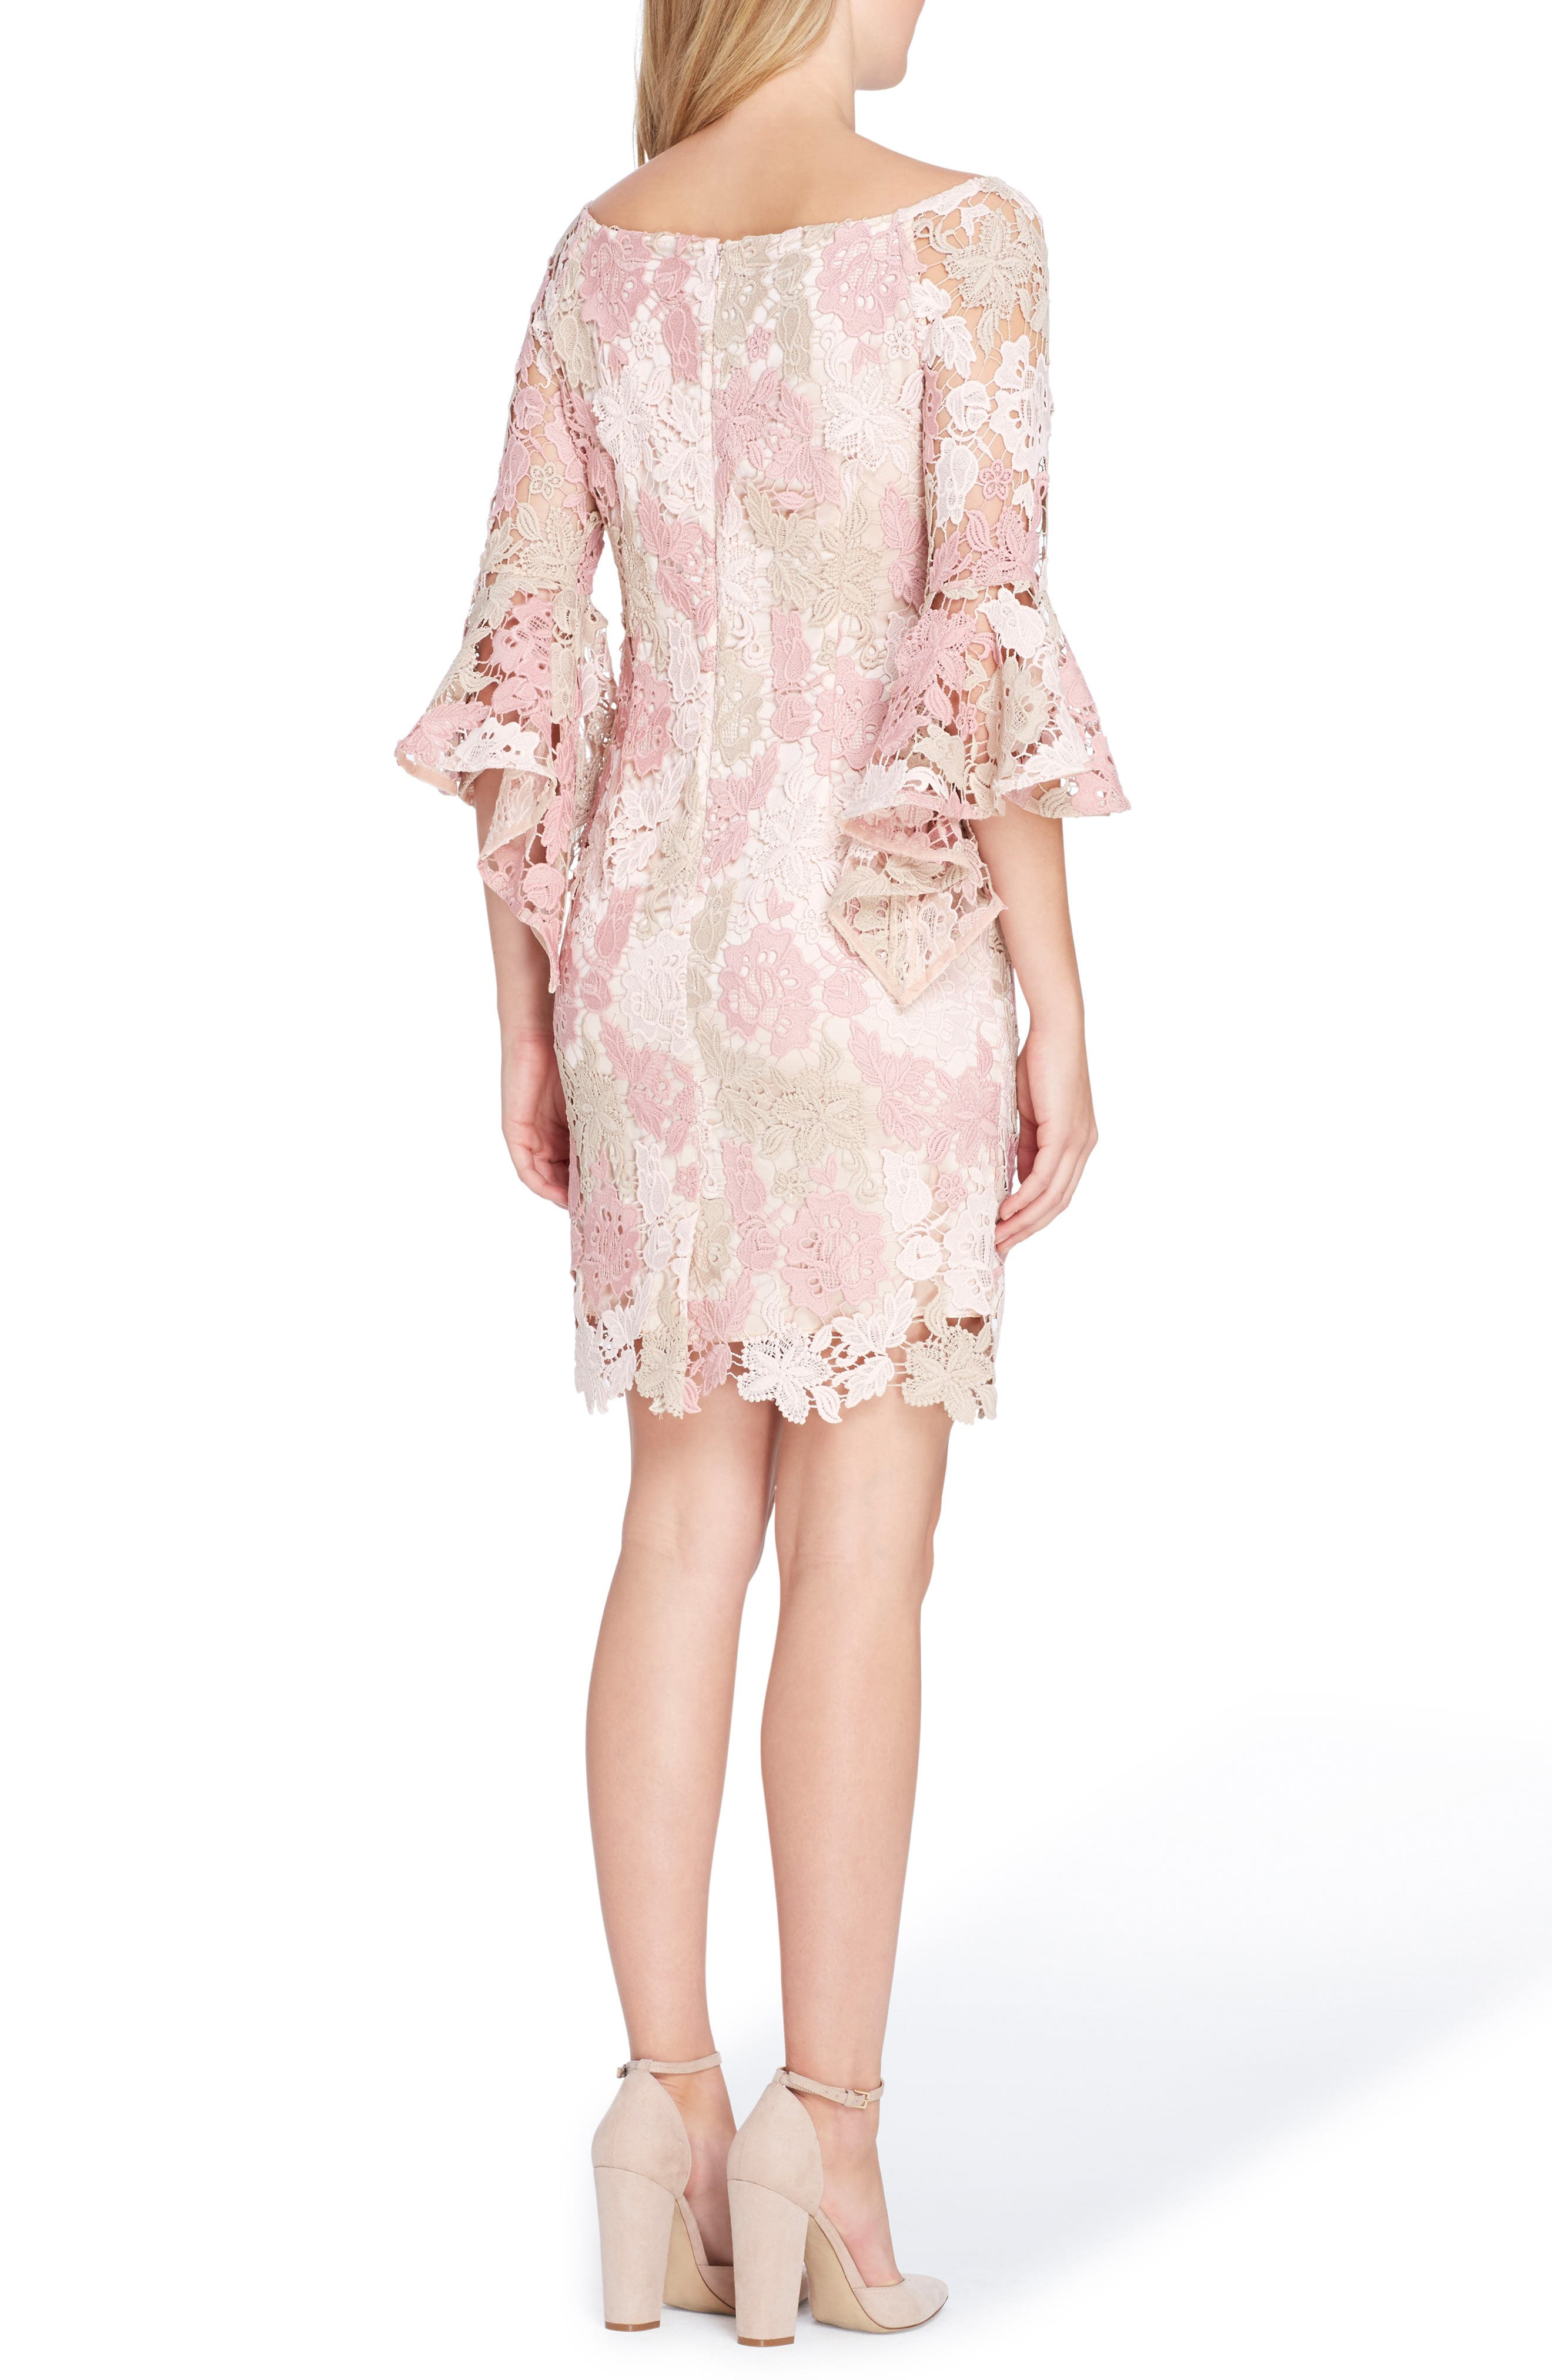 Lace Bell Sleeve Sheath Dress,                             Alternate thumbnail 2, color,                             Blush/ Rose/ Taupe